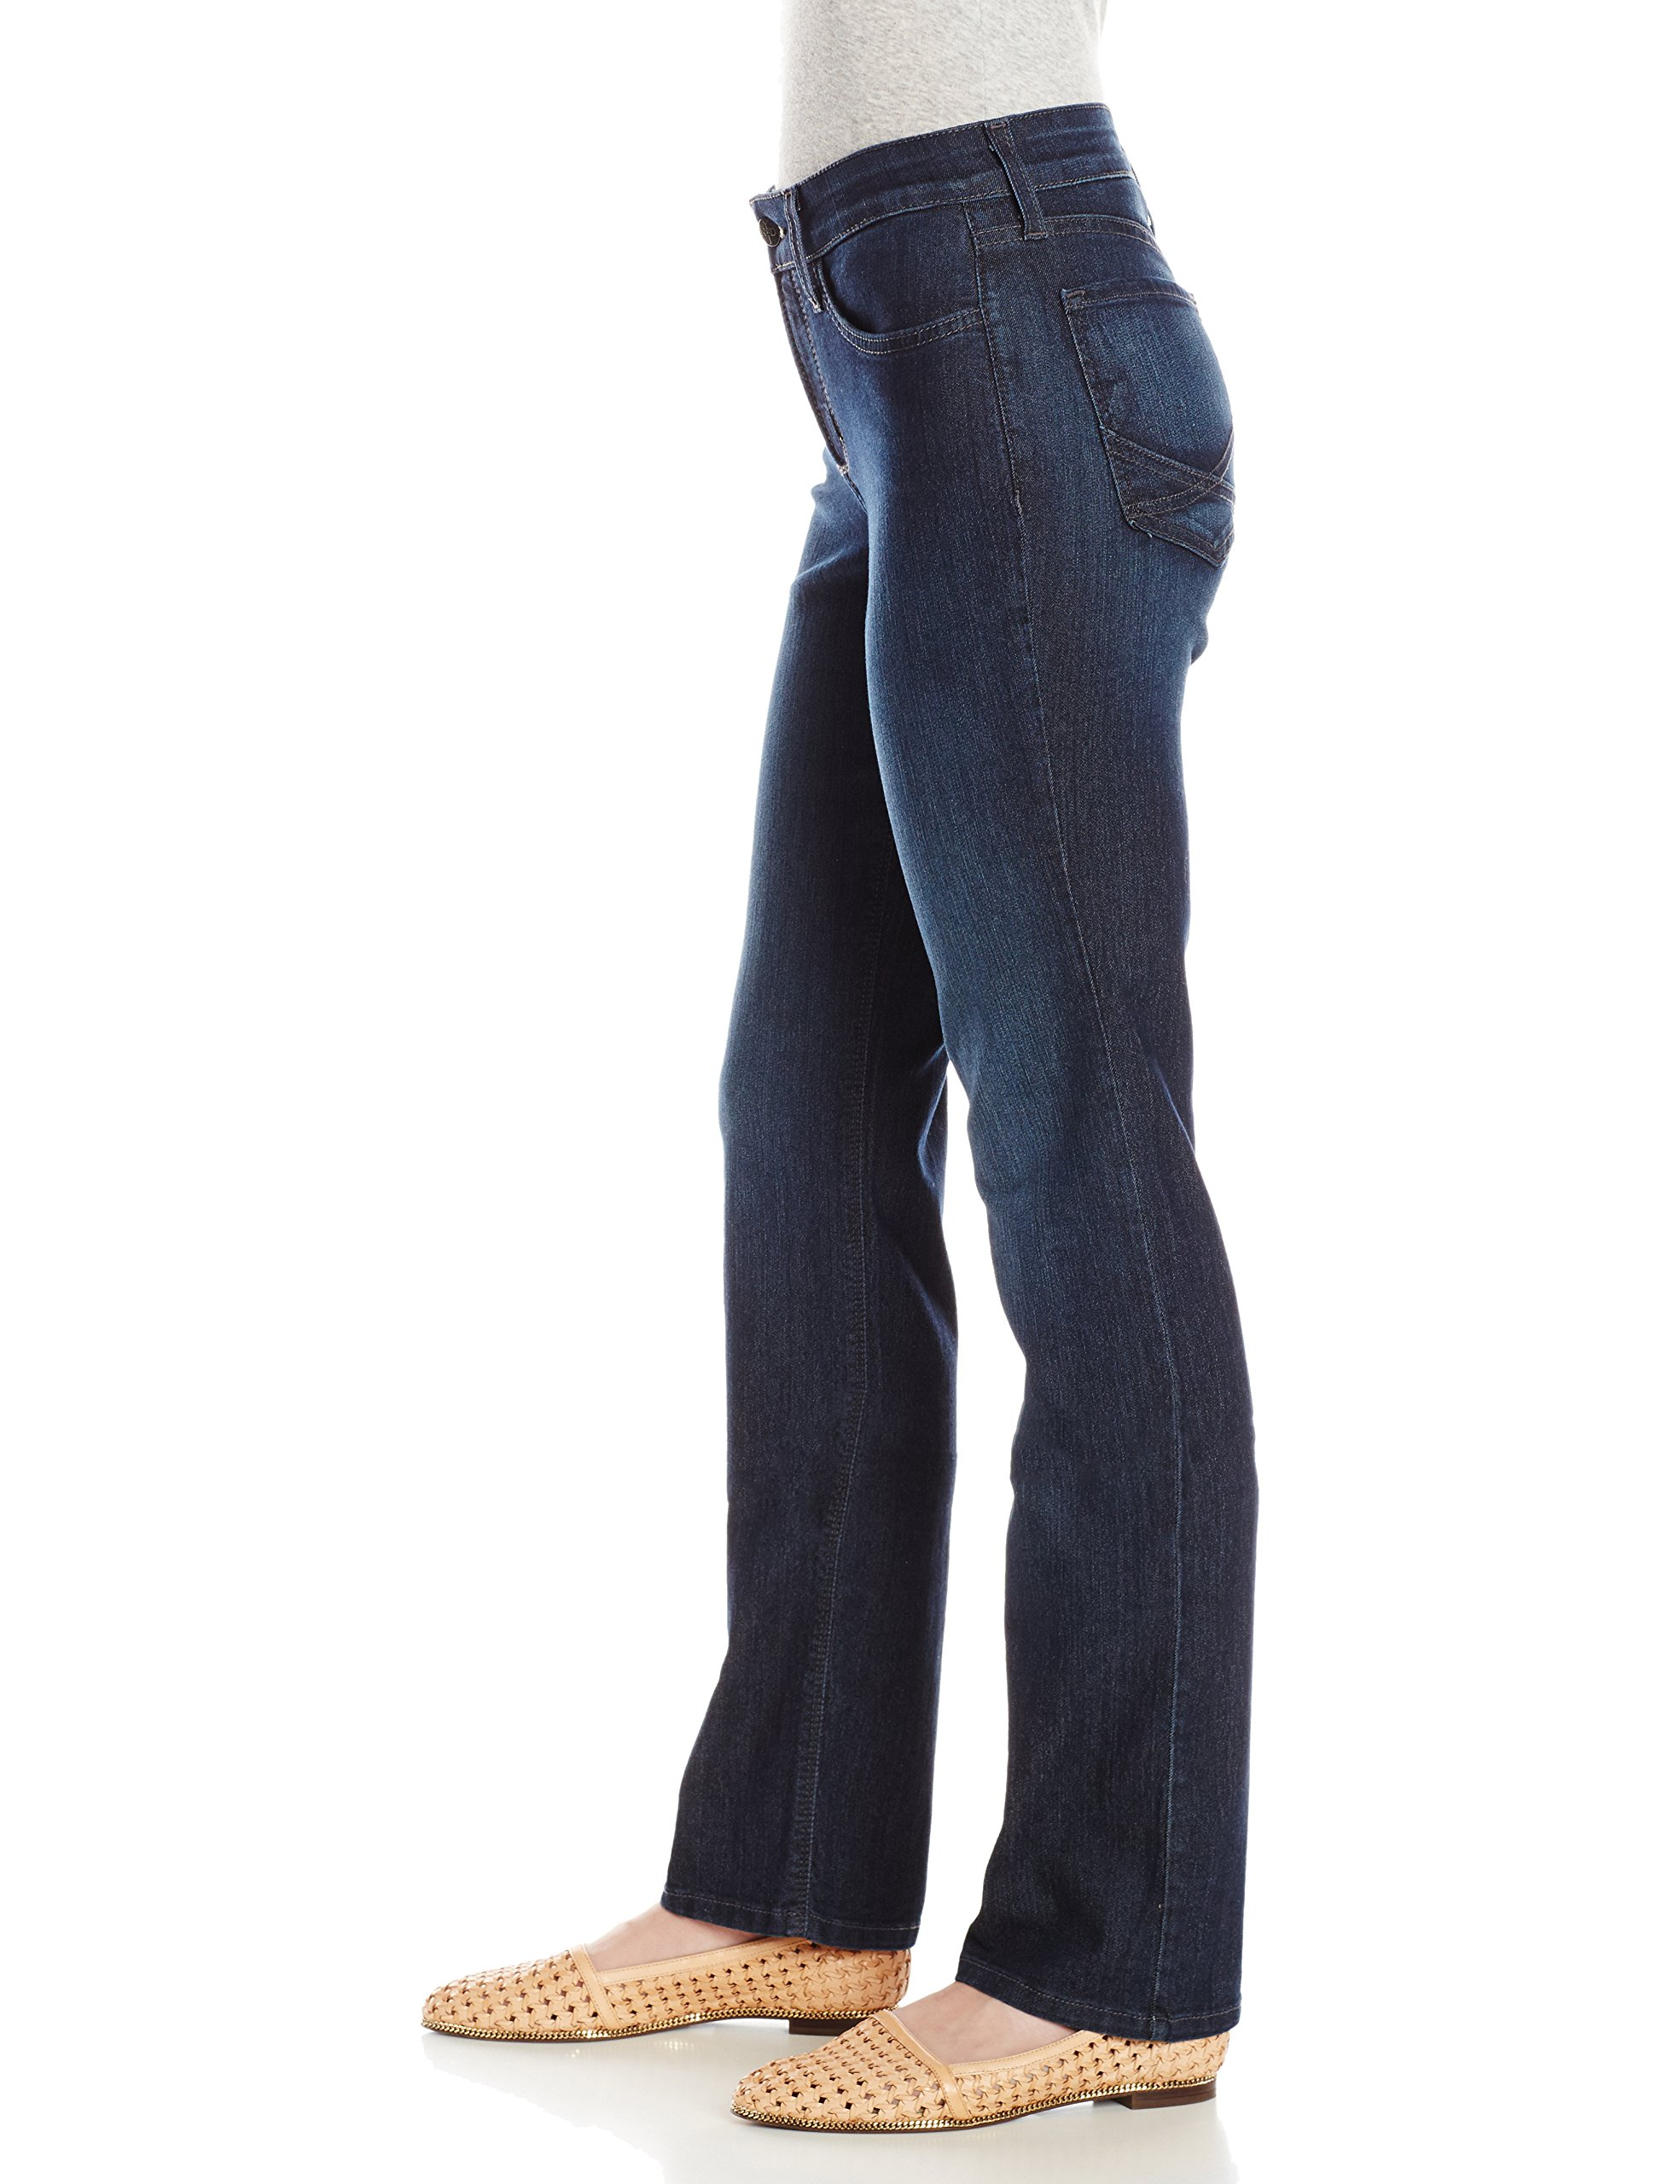 NYDJ Women's Petite Marilyn Straight Jeans In Premium Lightweight Denim, Burbank Wash, 16P by NYDJ (Image #3)